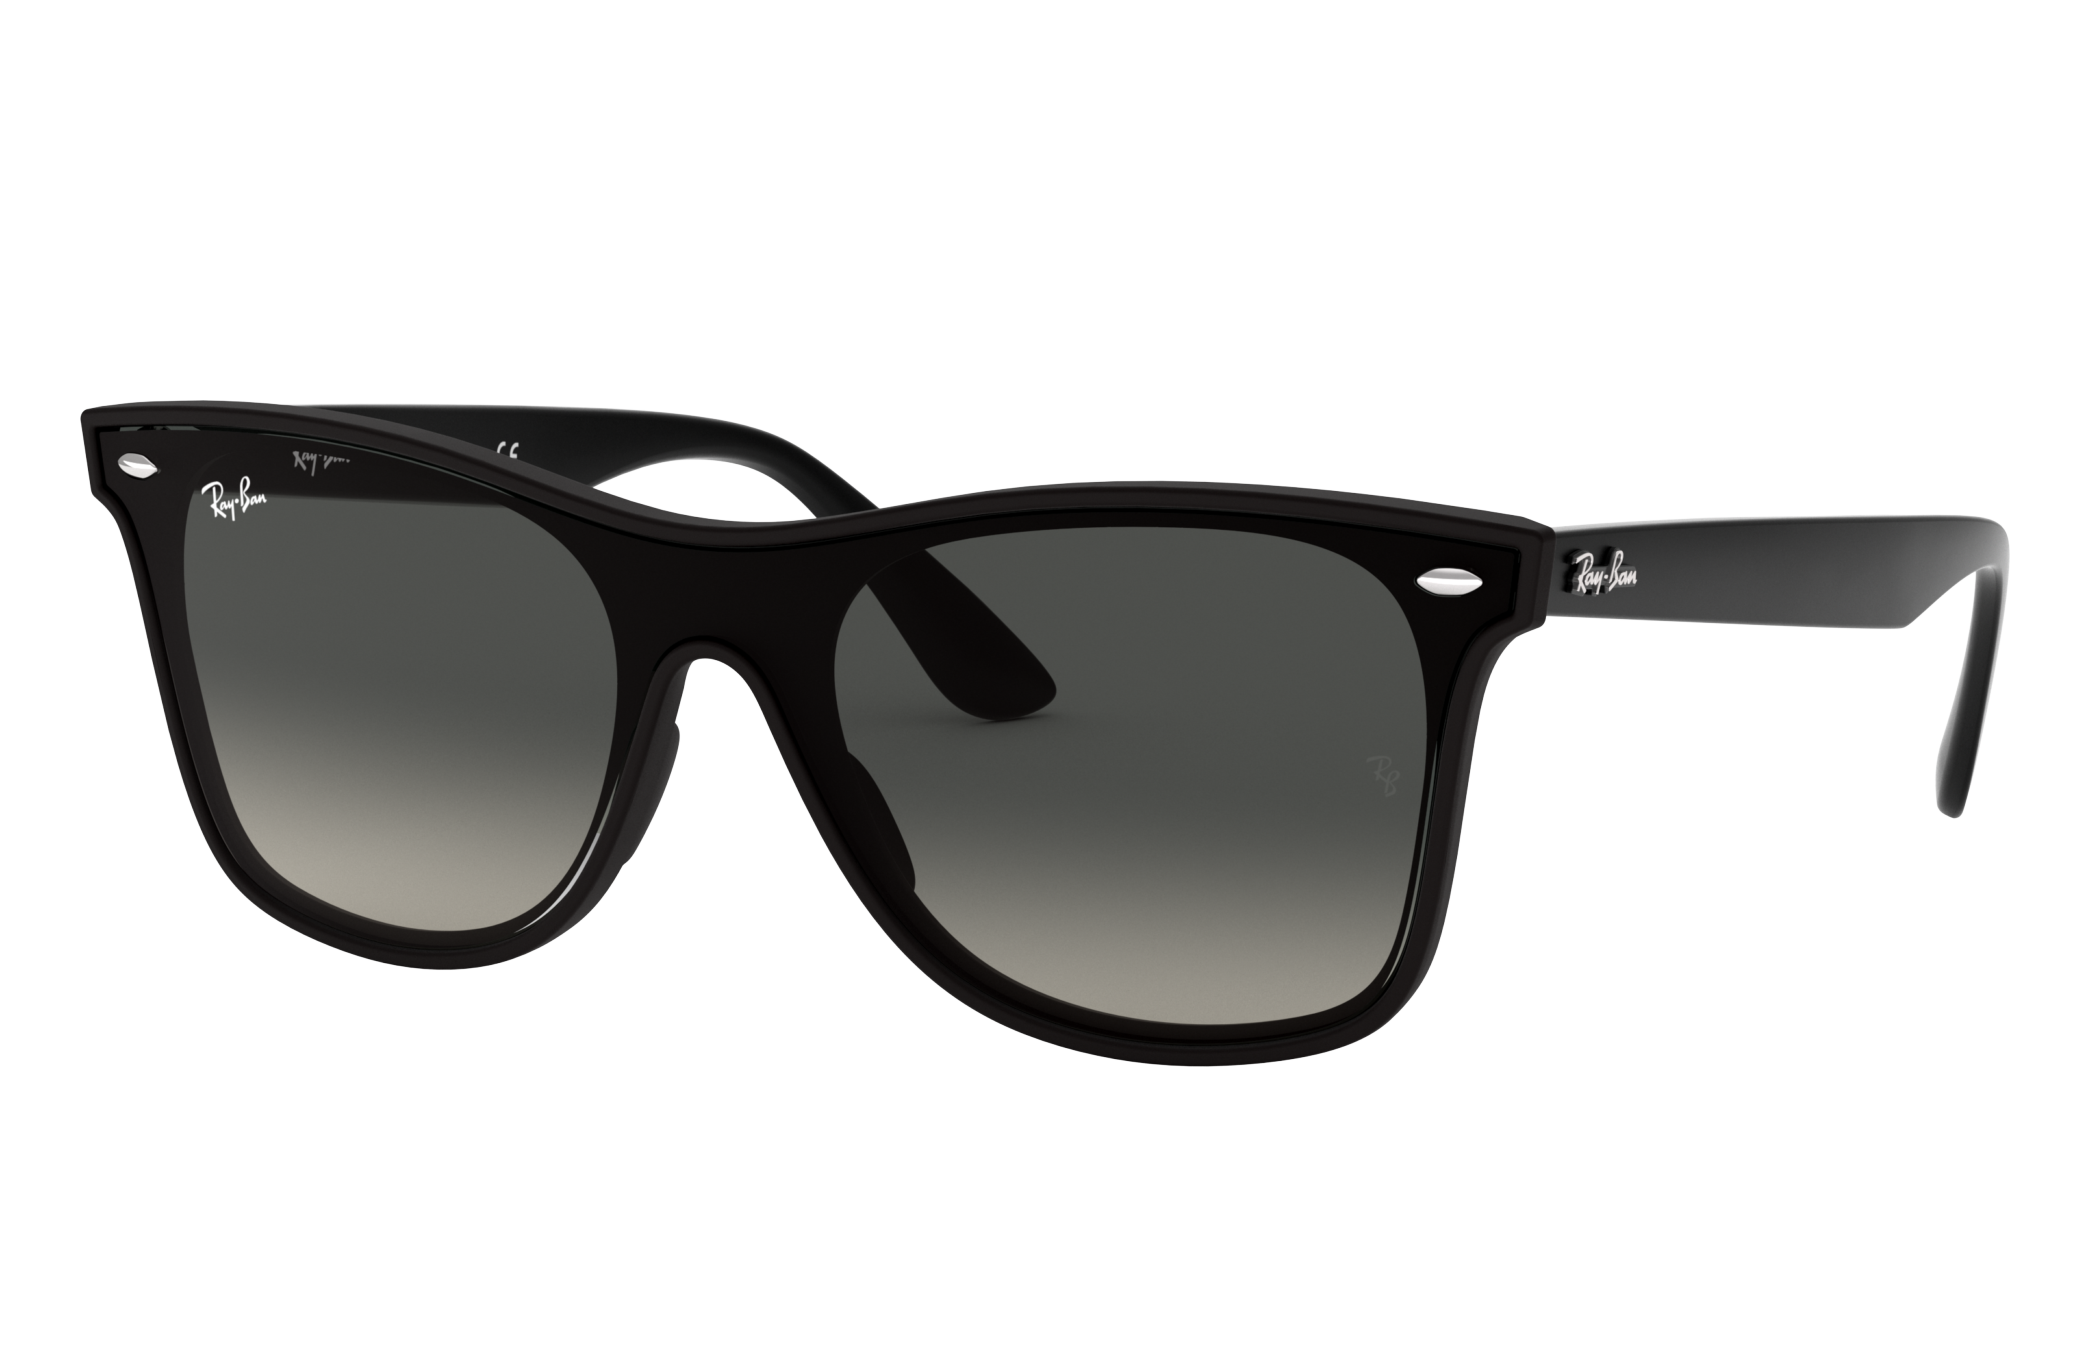 Ray-Ban Blaze Wayfarer Black, Gray Lenses - RB4440N